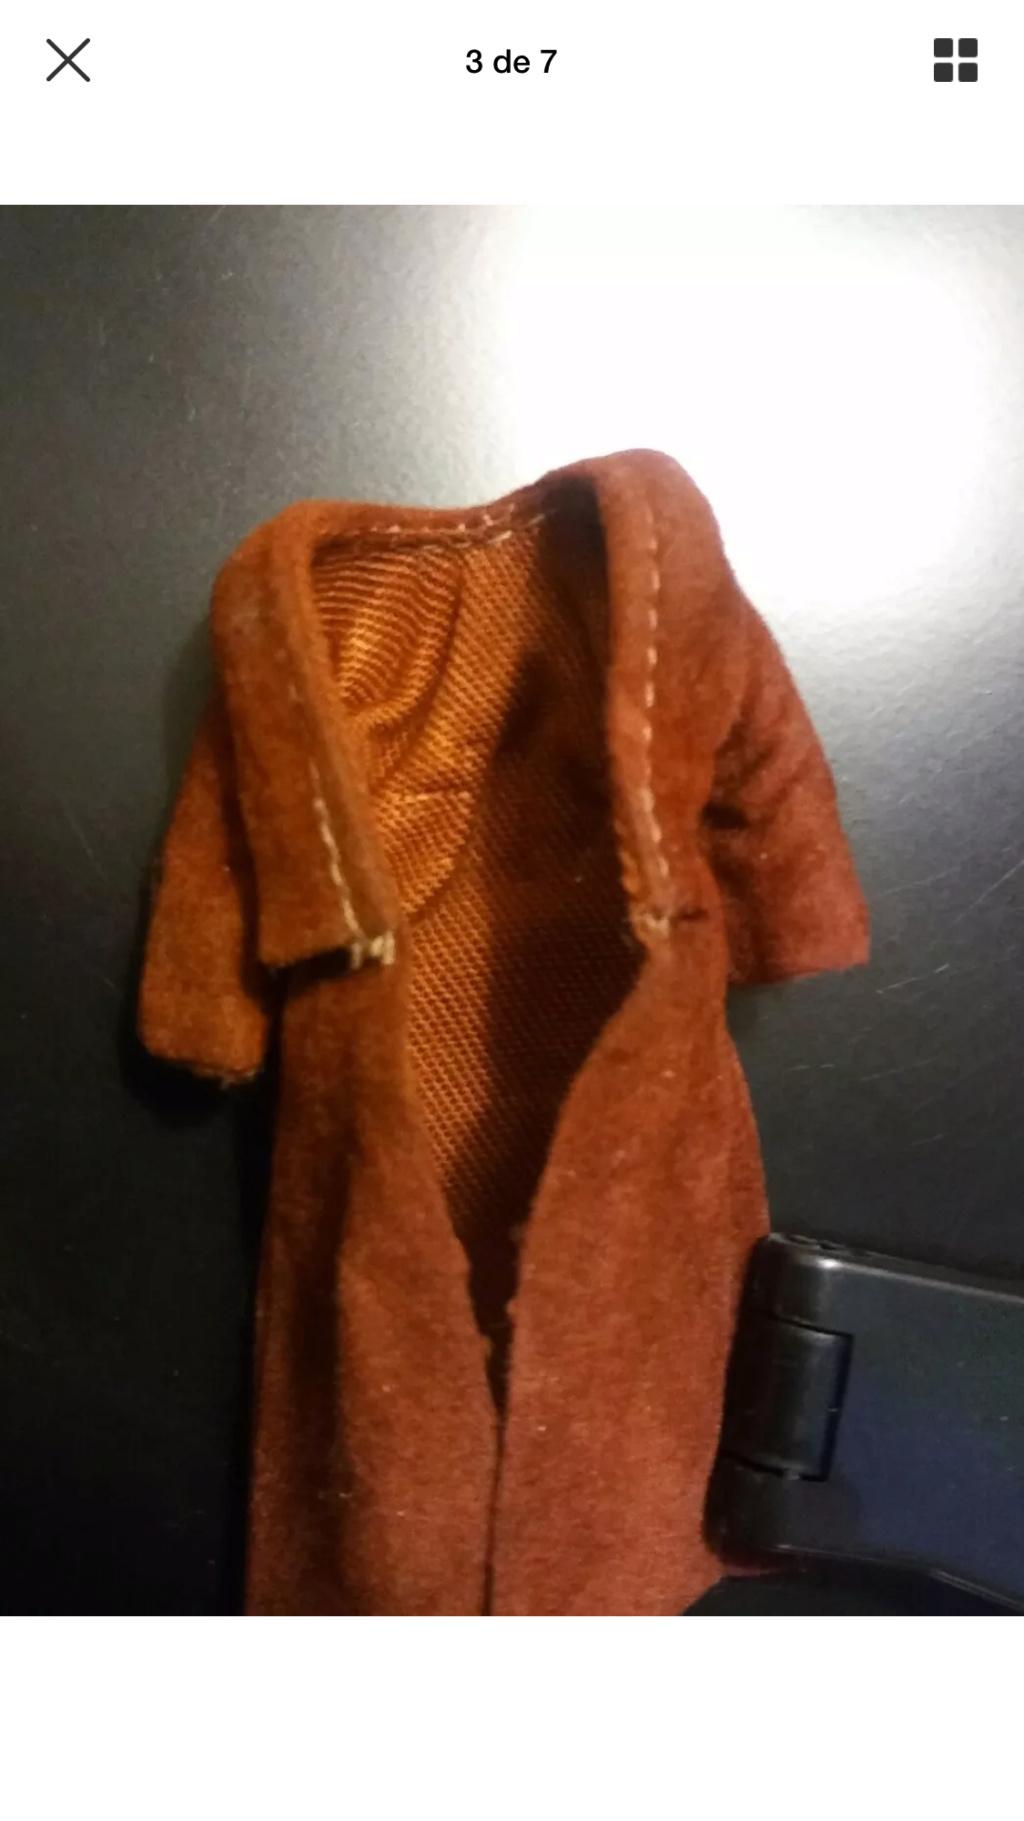 Lili Ledy Bib Fortuna Burgundy Coat complete Figure 7fa33210